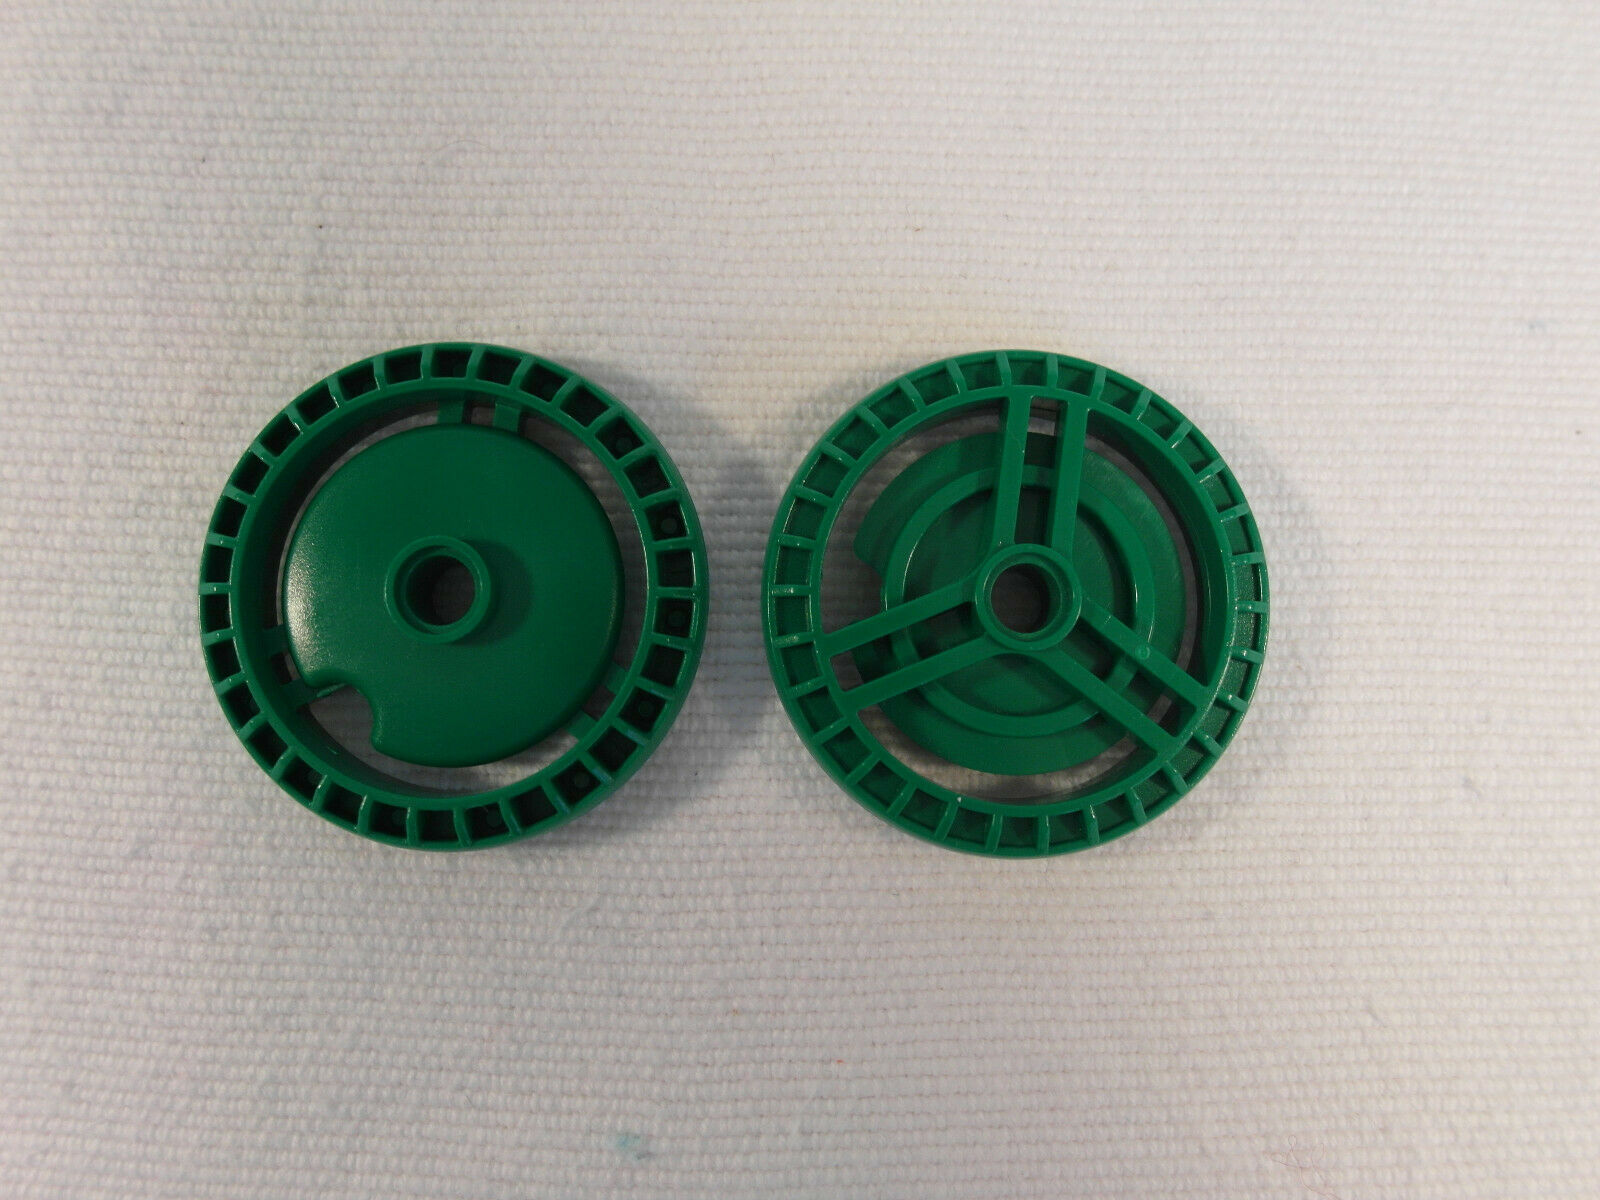 Lego 2 x Technic Disc Scheibenbremse  32439  grün 5x5